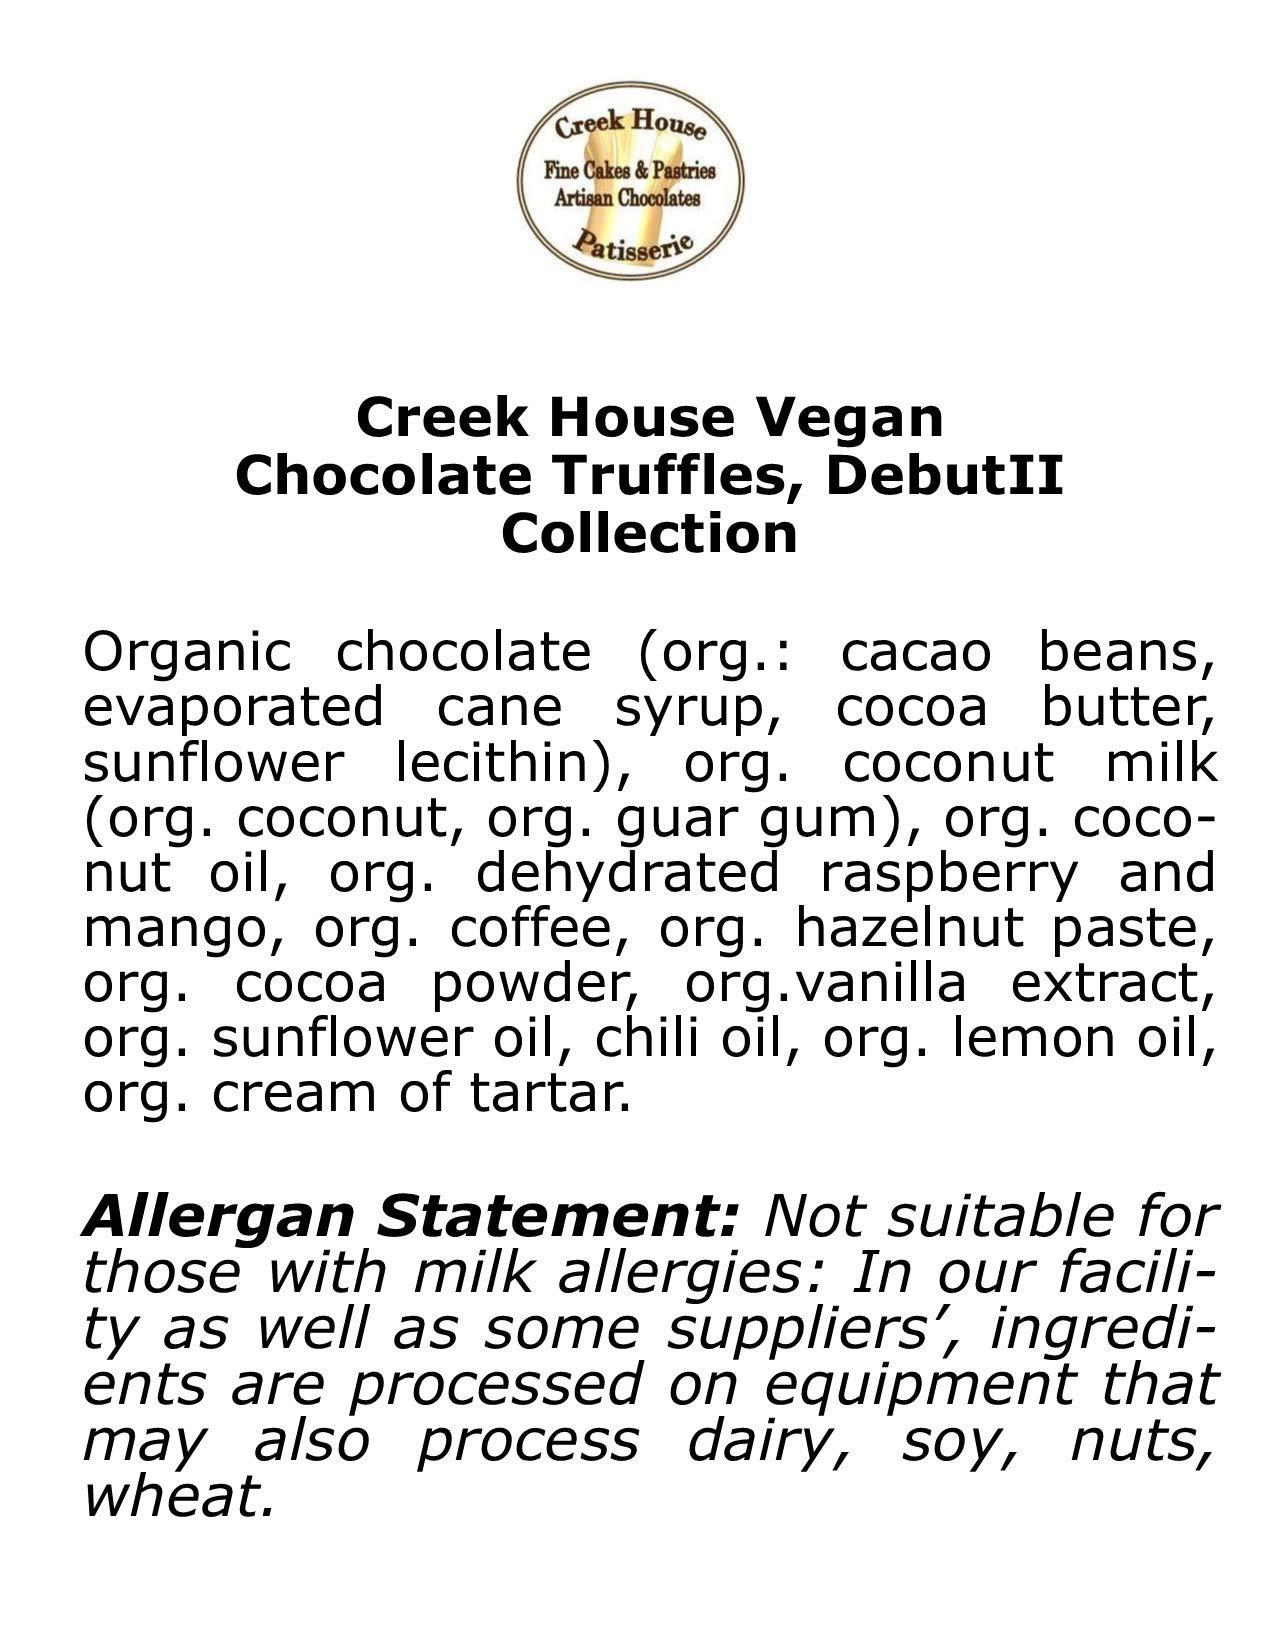 Creek House 12 Piece Organic Vegan Chocolate Truffles, DebutII